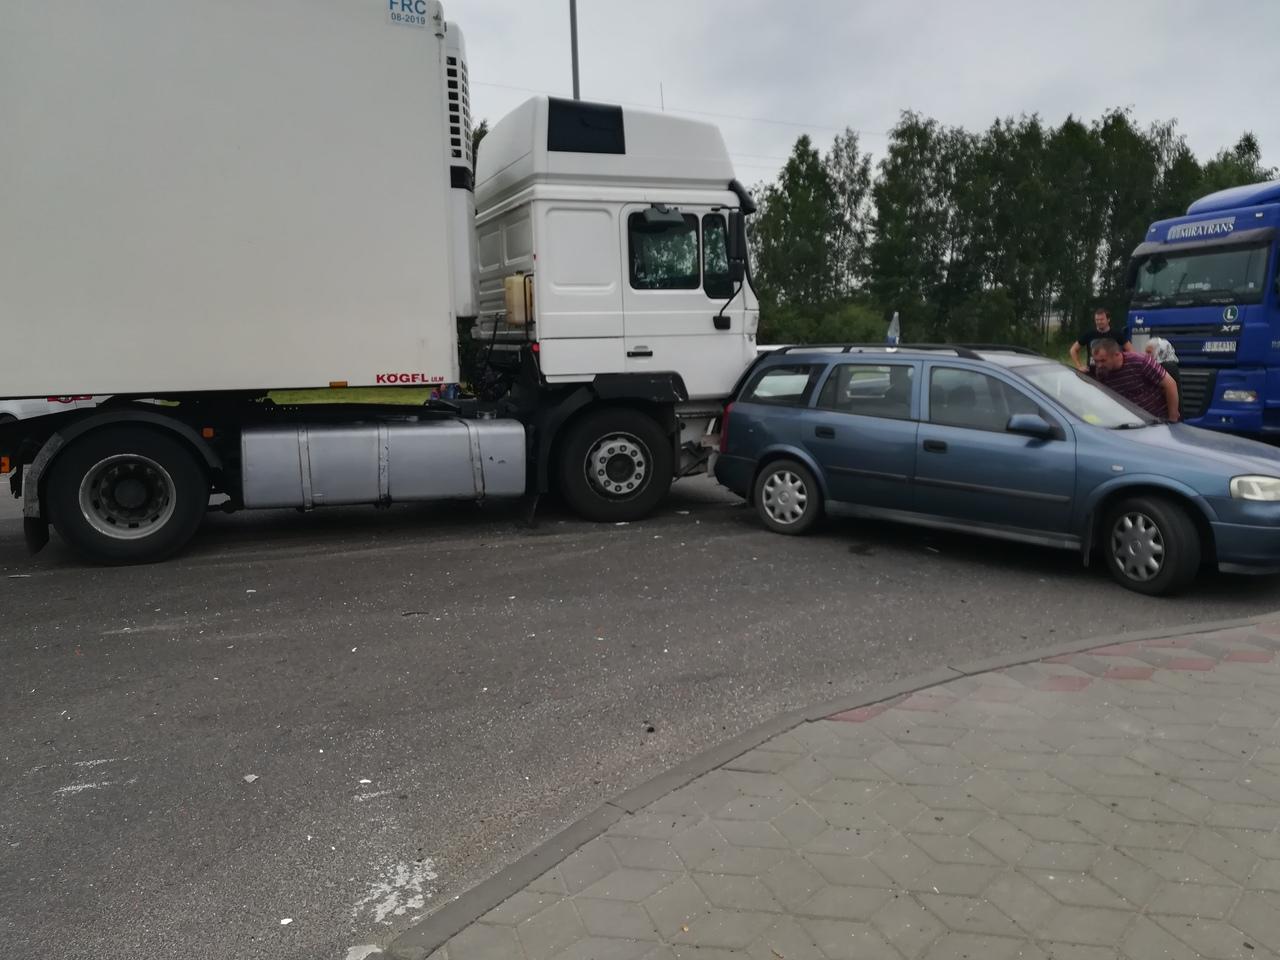 ДТП на ул. Катин Бор - фура врезалась в легковой автомобиль